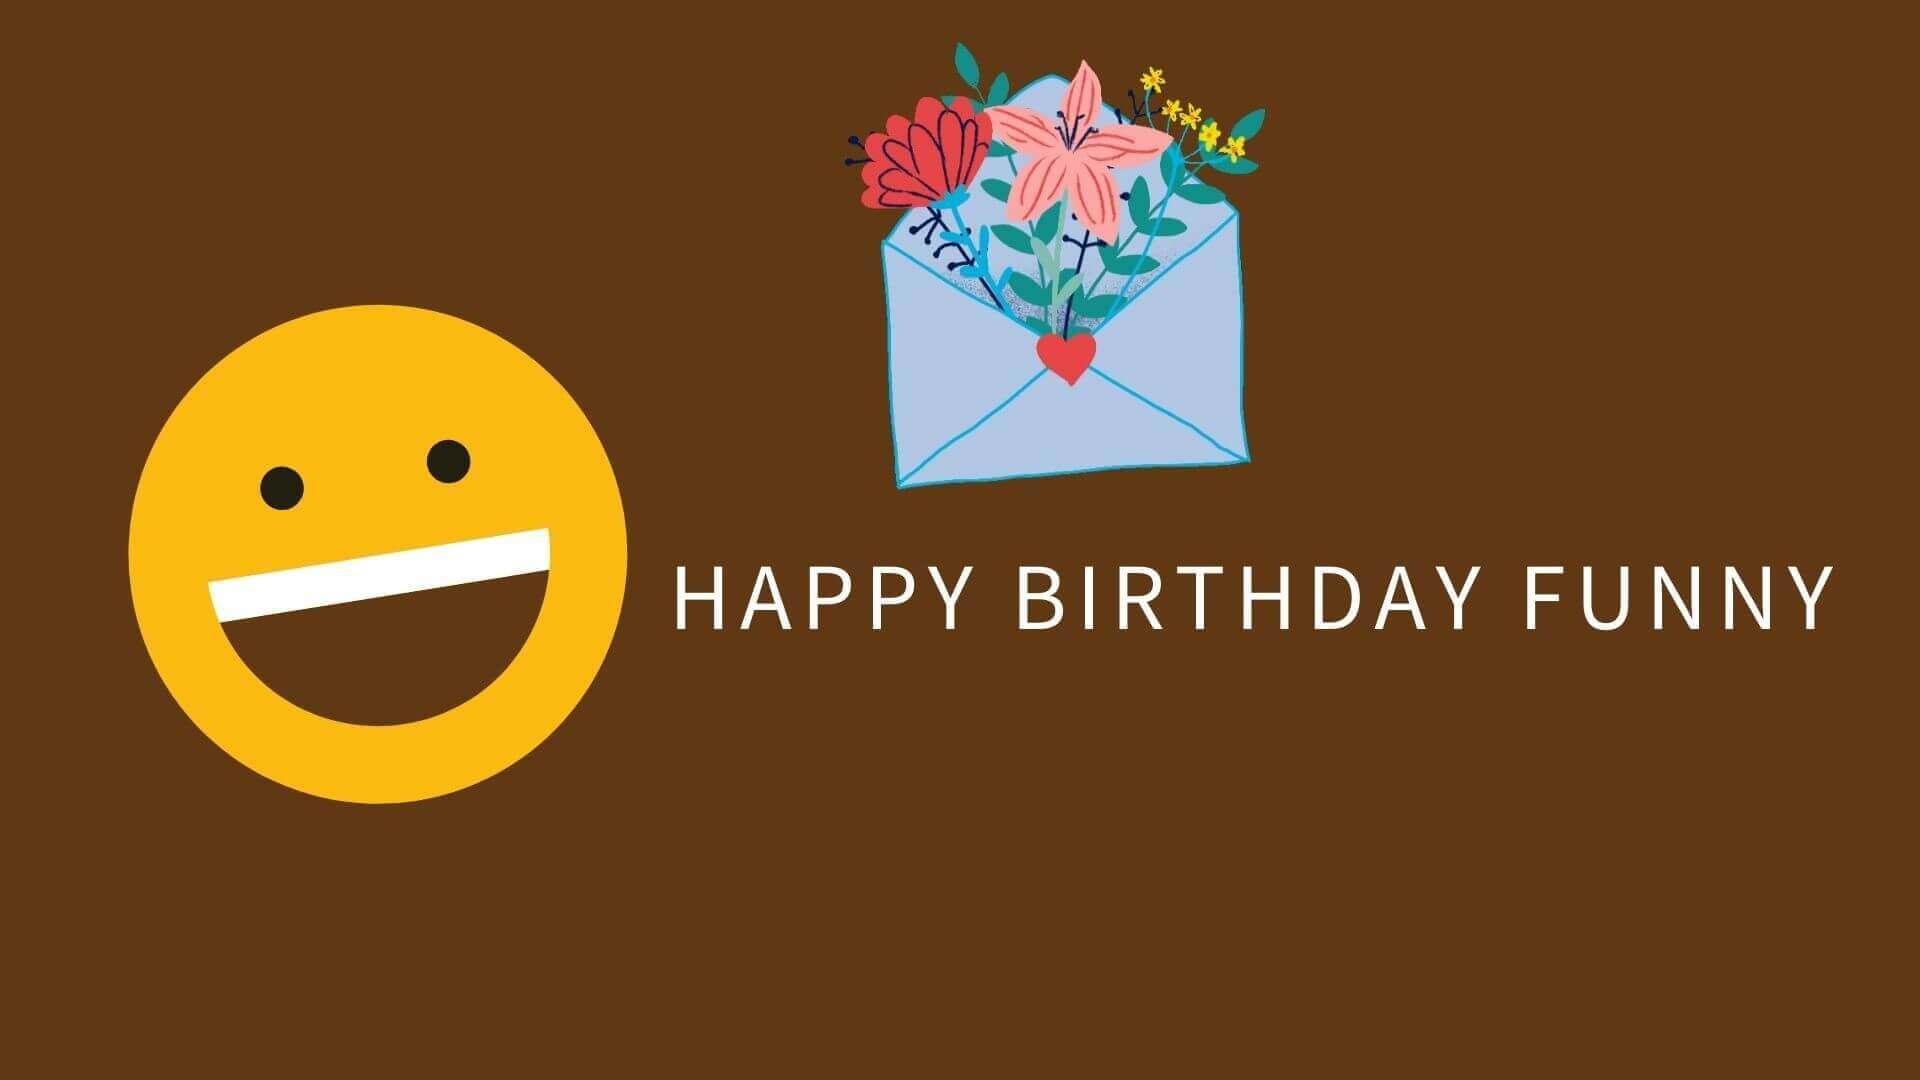 Happy Birthday Funny Friend Image